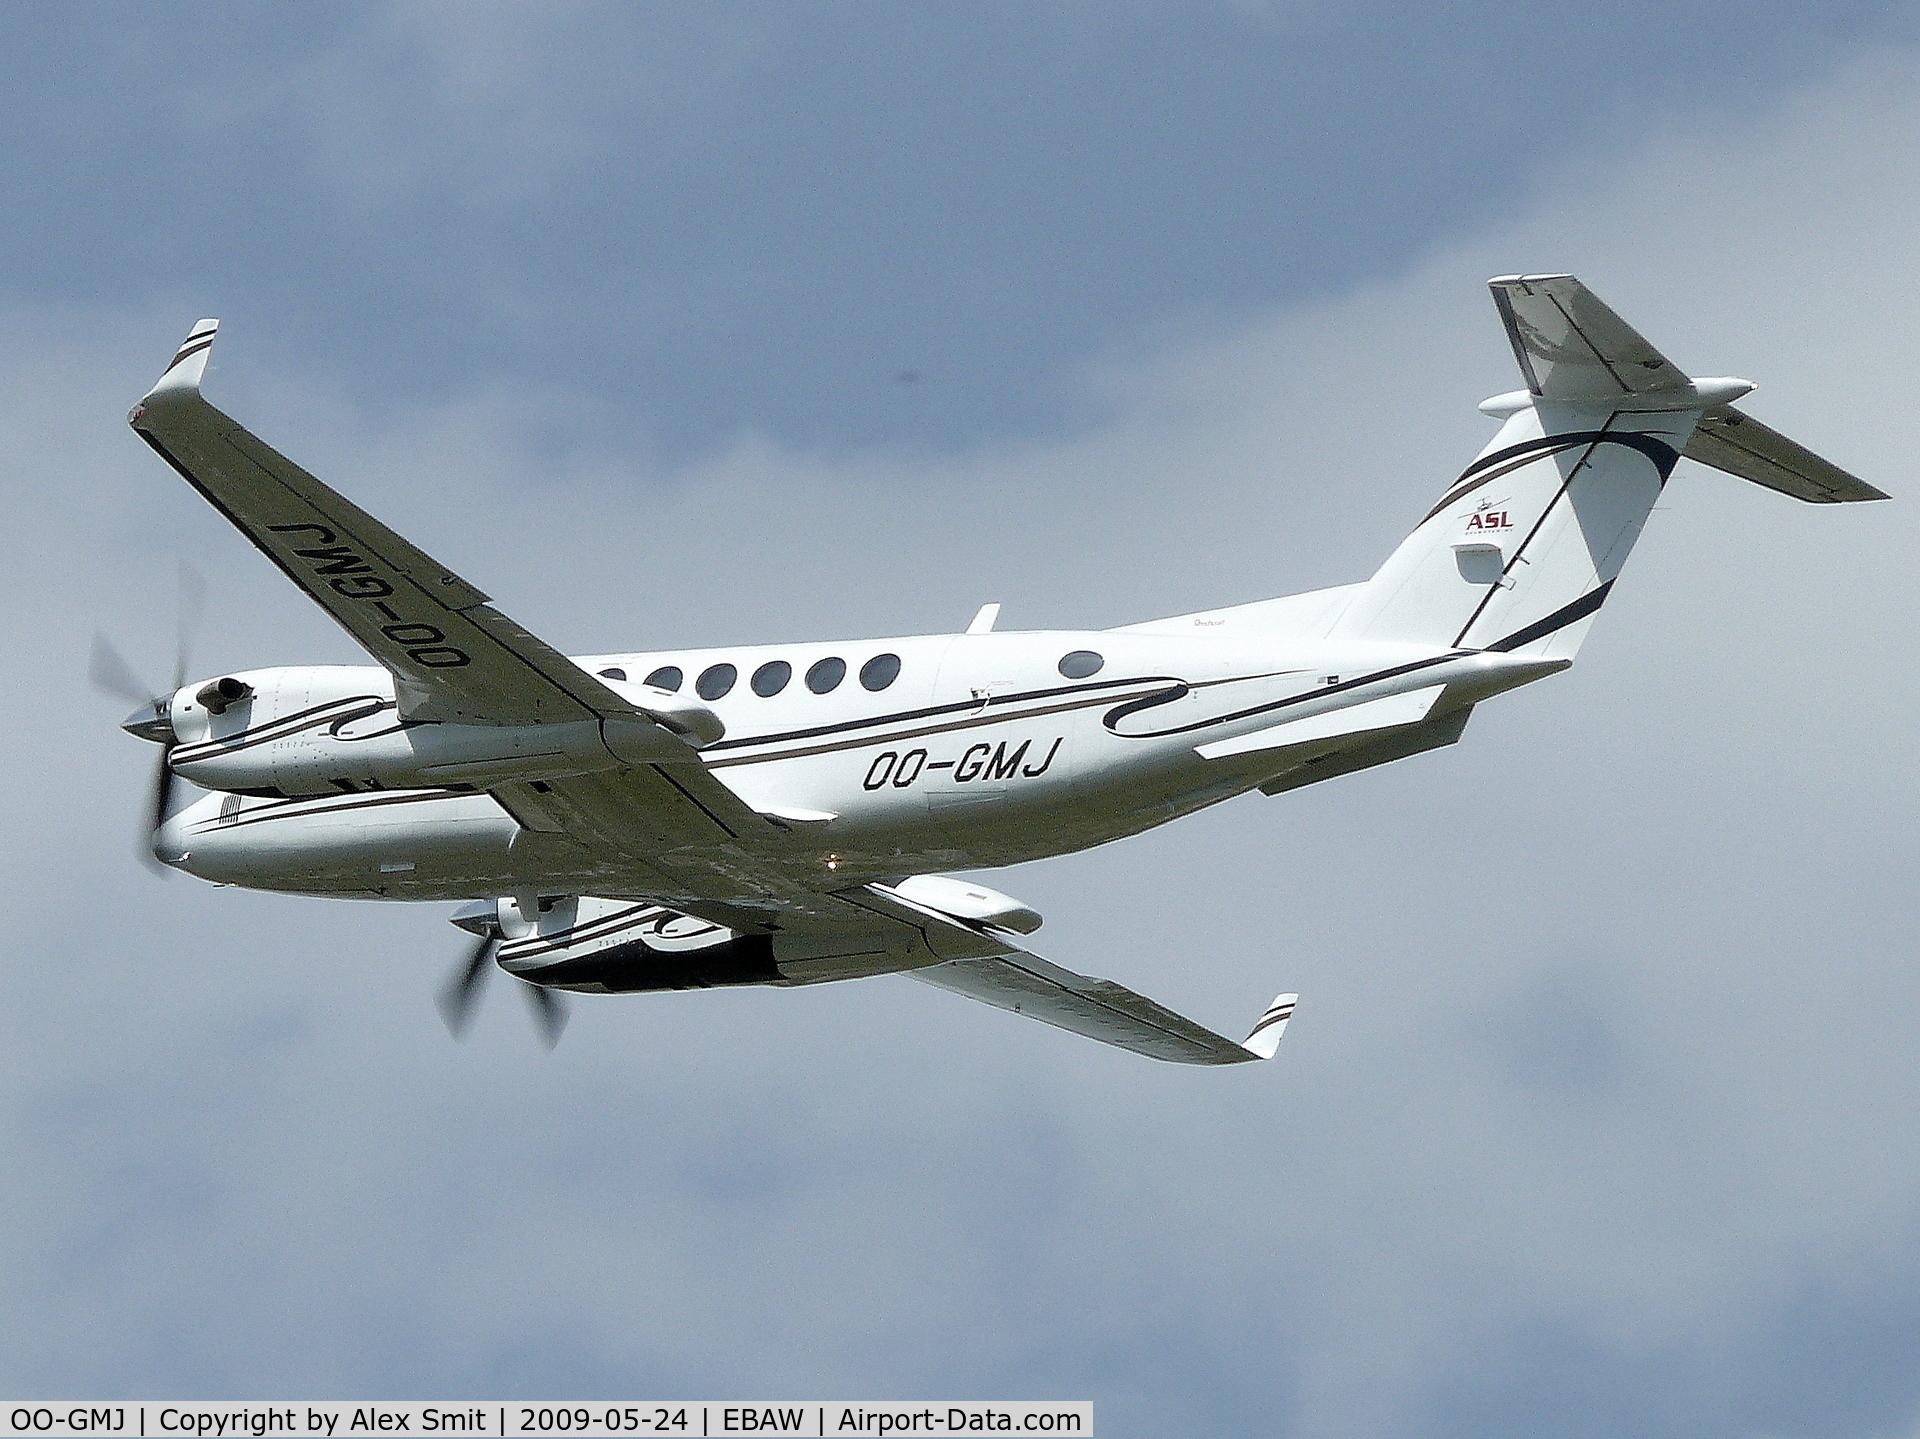 OO-GMJ, Raytheon Aircraft Company B300 C/N FL-460, Beechcraft BeB300 Super King Air 350 OO-GMJ Air Service Liege